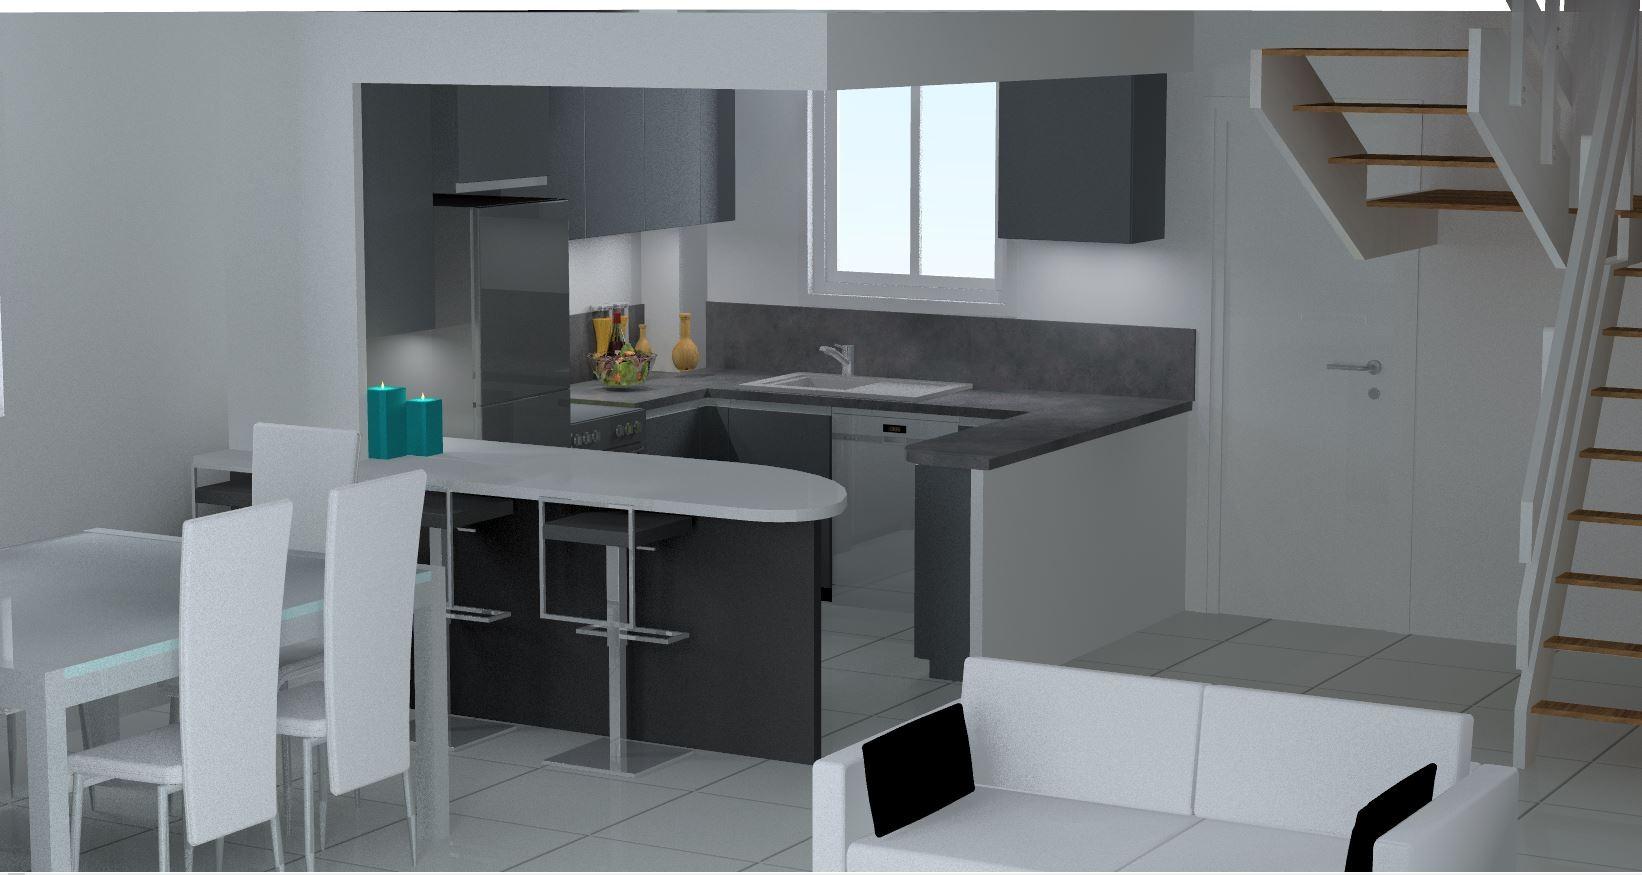 visuel 3D cuisine haut de gamme